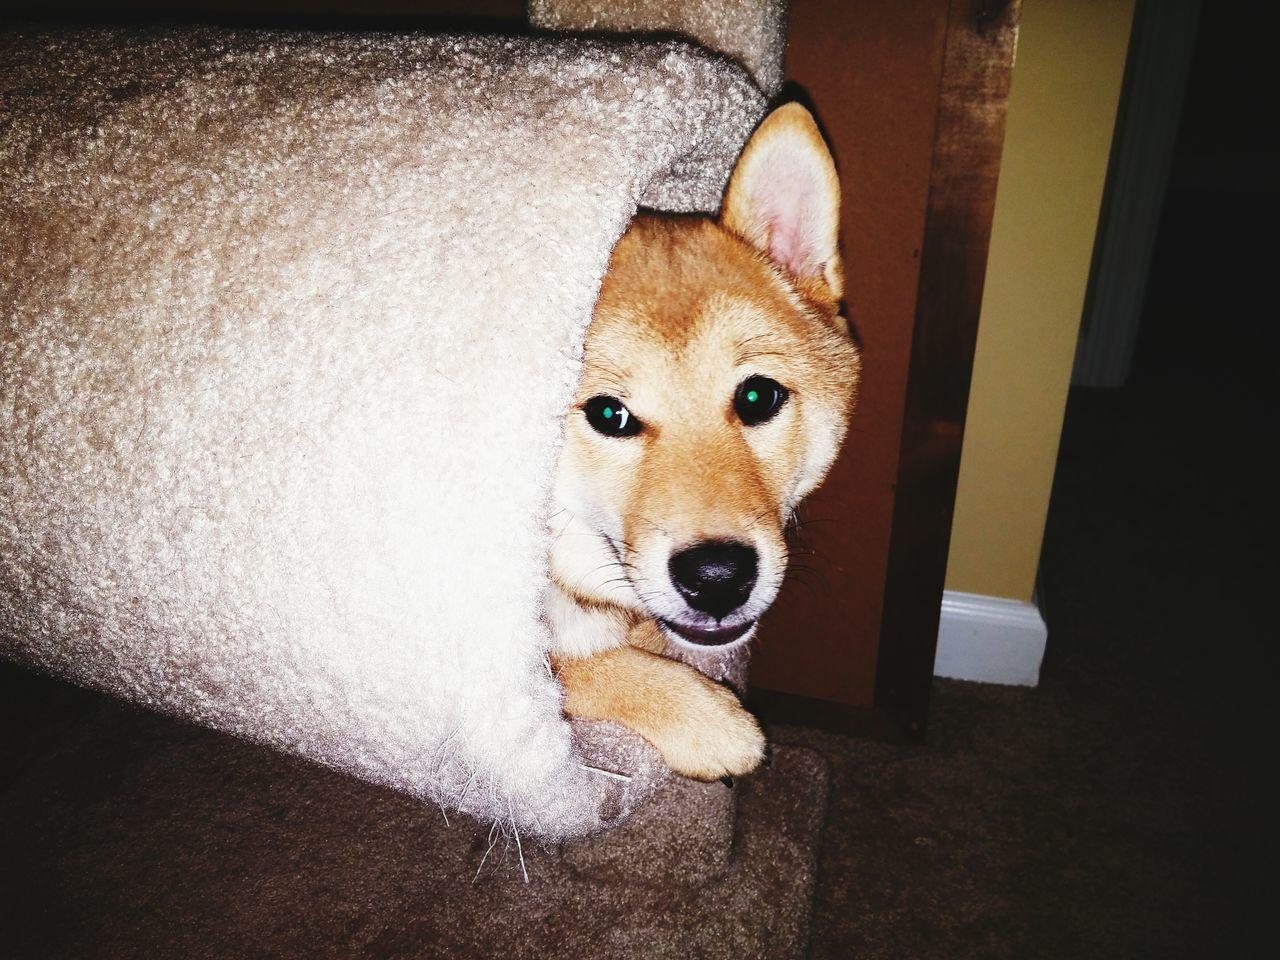 EyeEm Selects Dog In A Cat Tree Shiba Inu Dog Pets Close-up Pet Portraits